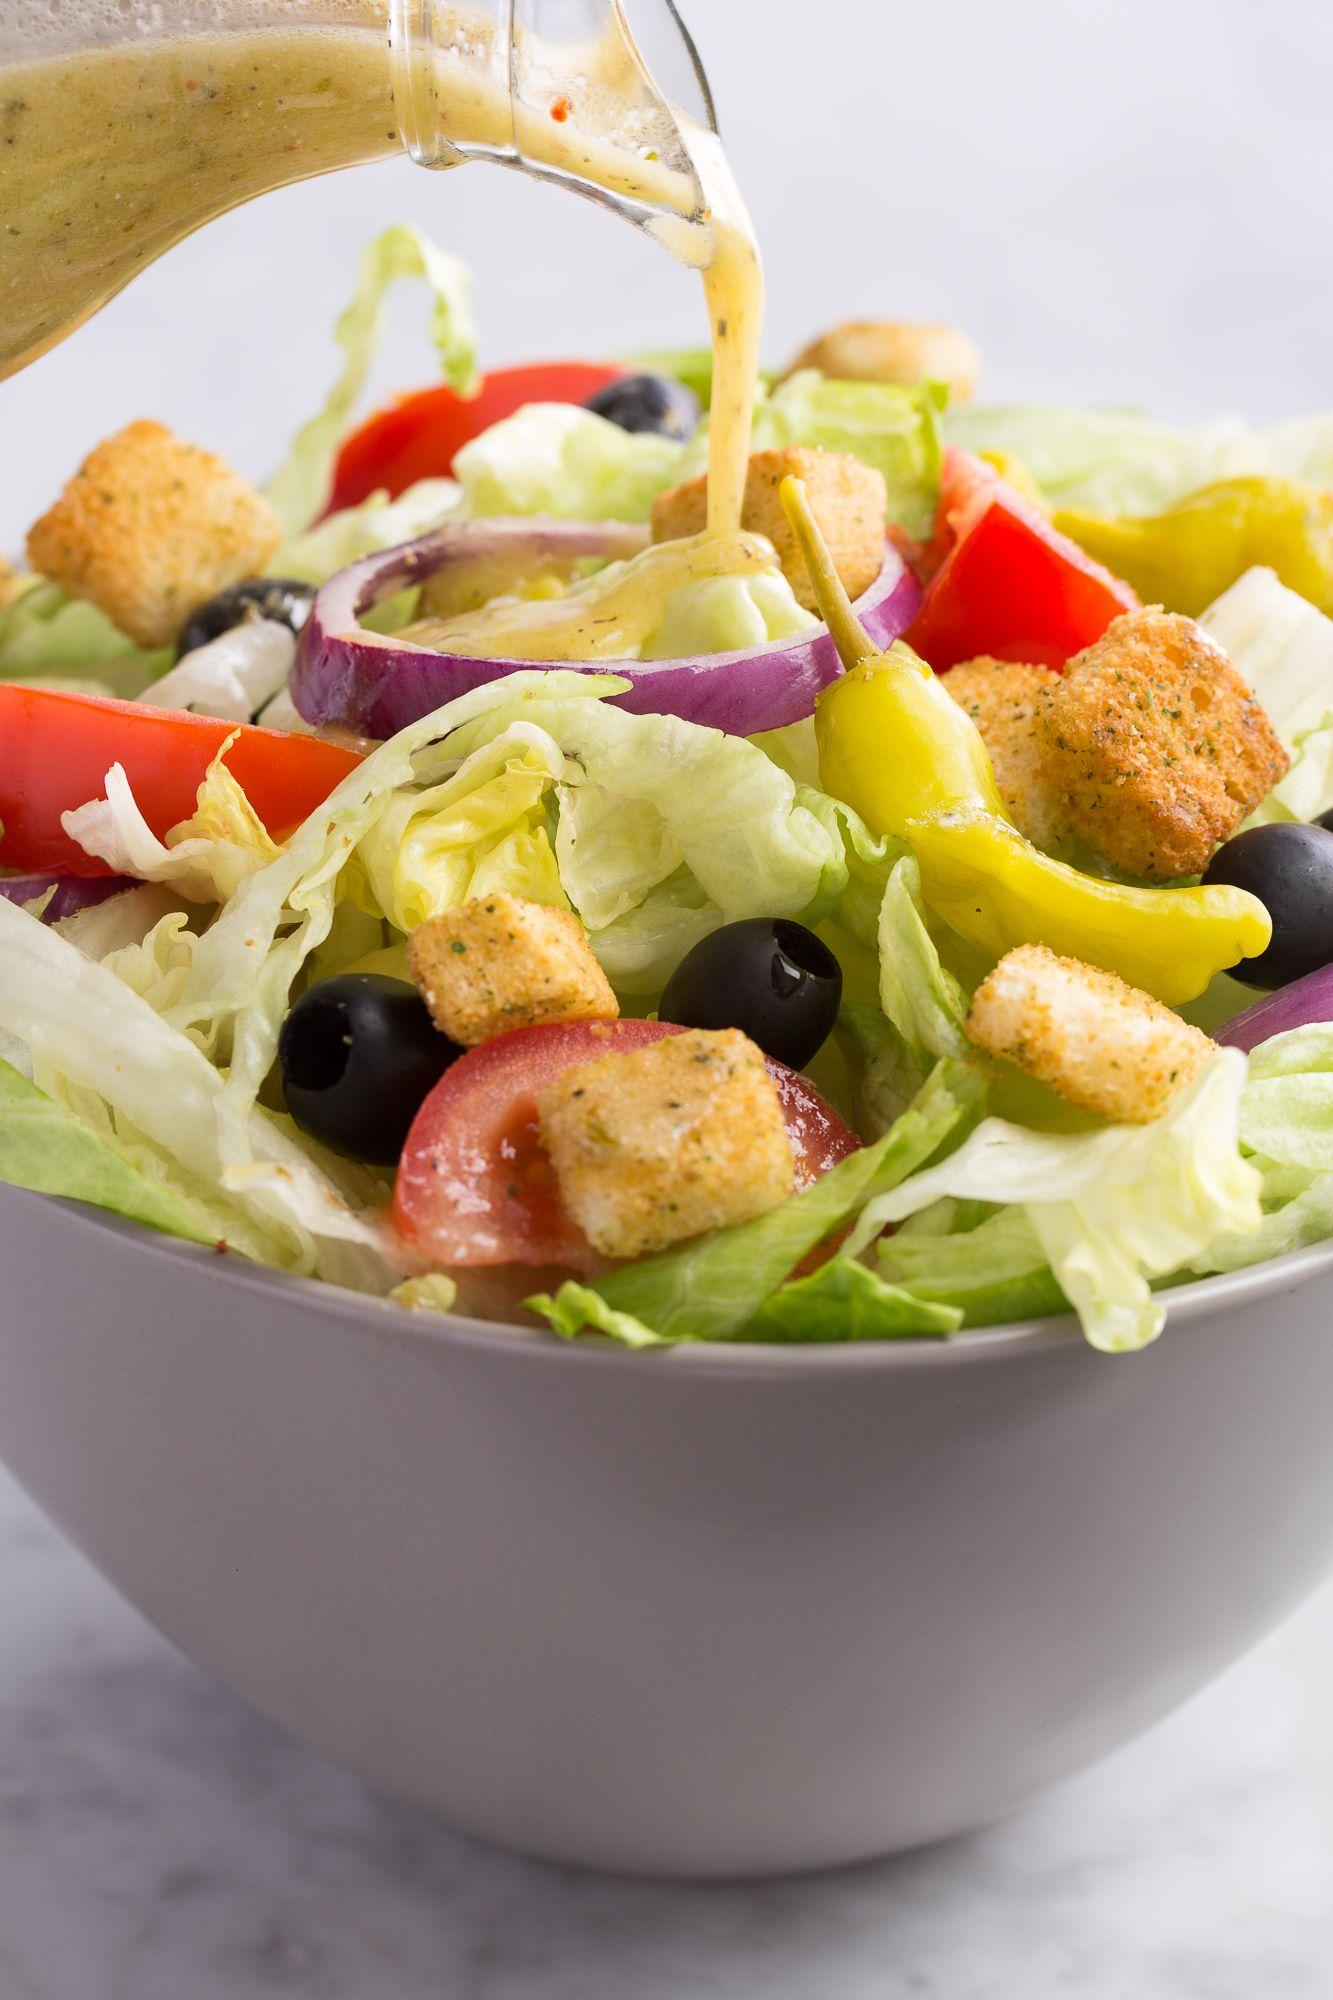 Copycat olive garden salad dressing recipe pecan pies - Olive garden italian salad dressing recipe ...